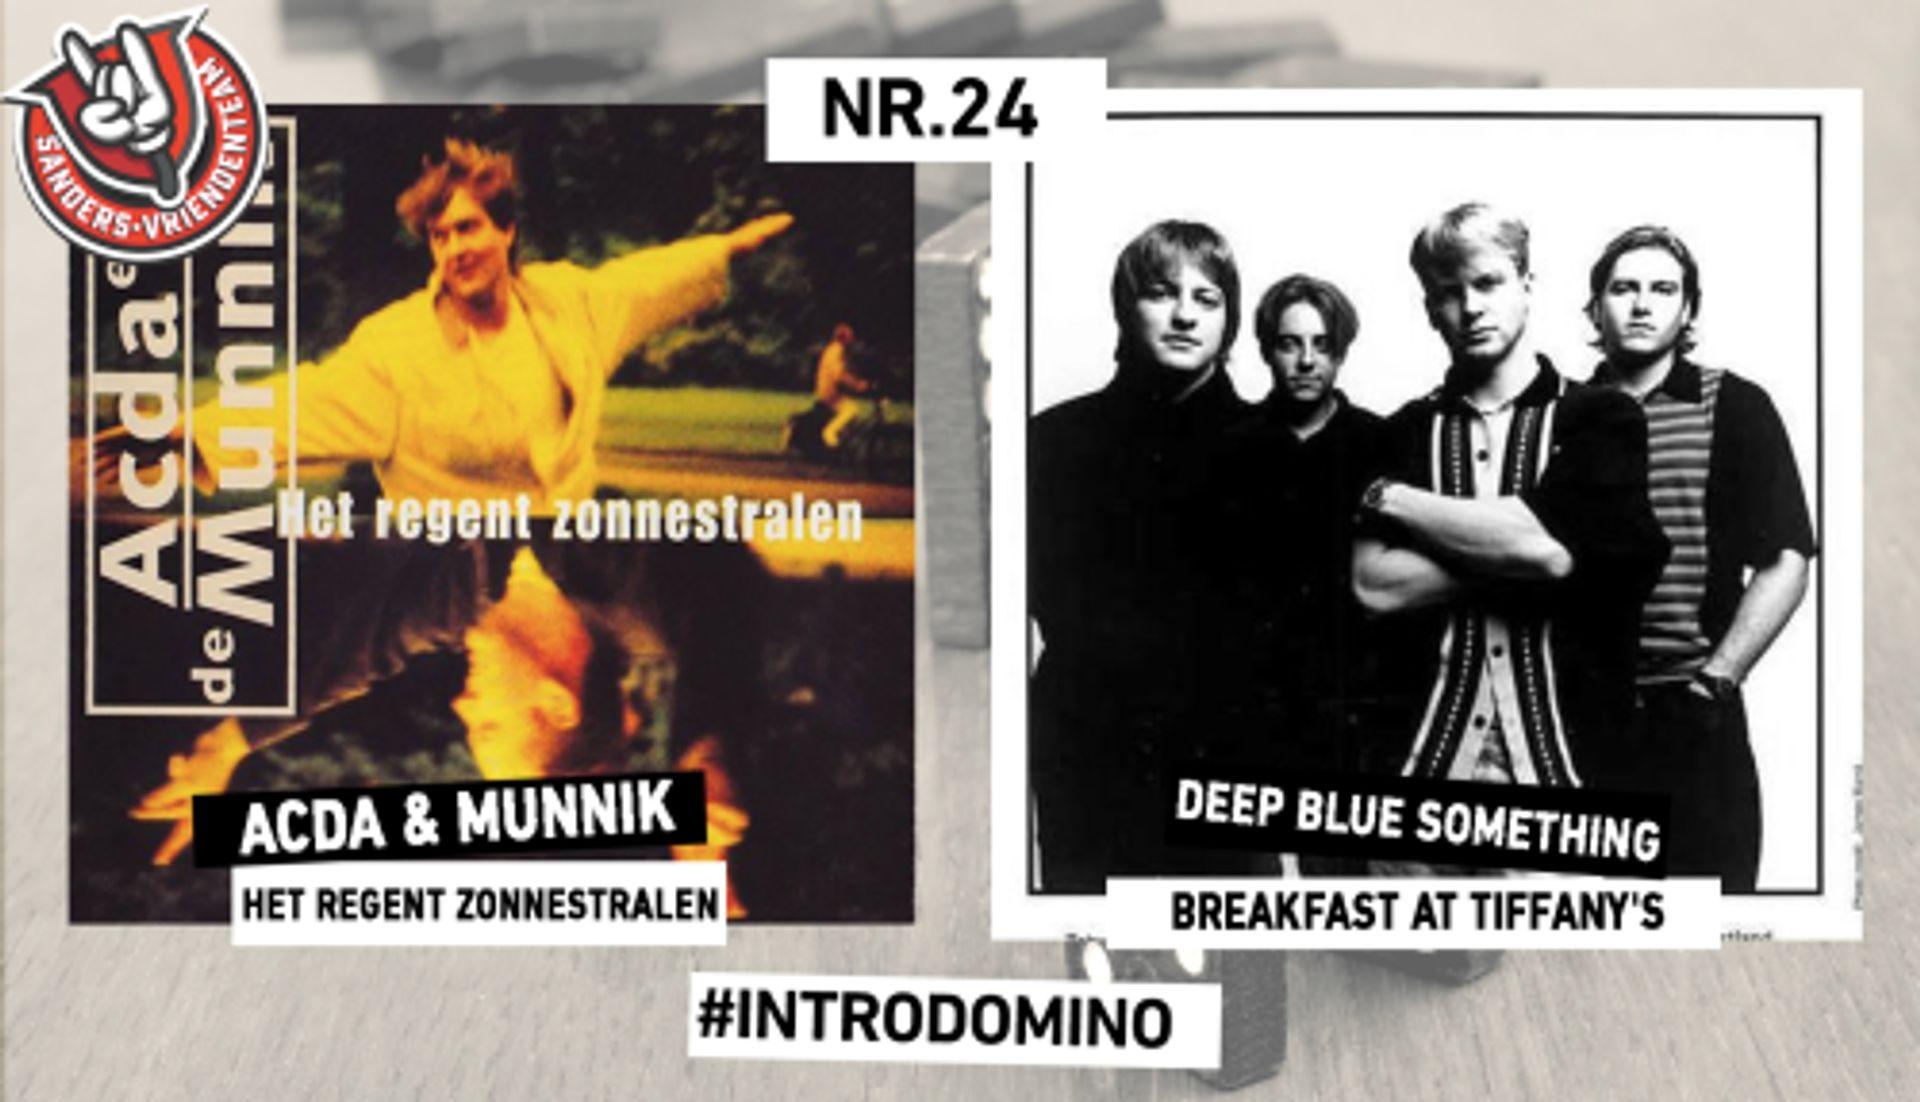 INTRODOMINO: ACDA & MUNNIK - HET REGENT ZONNESTRALEN & DEEP BLUE...